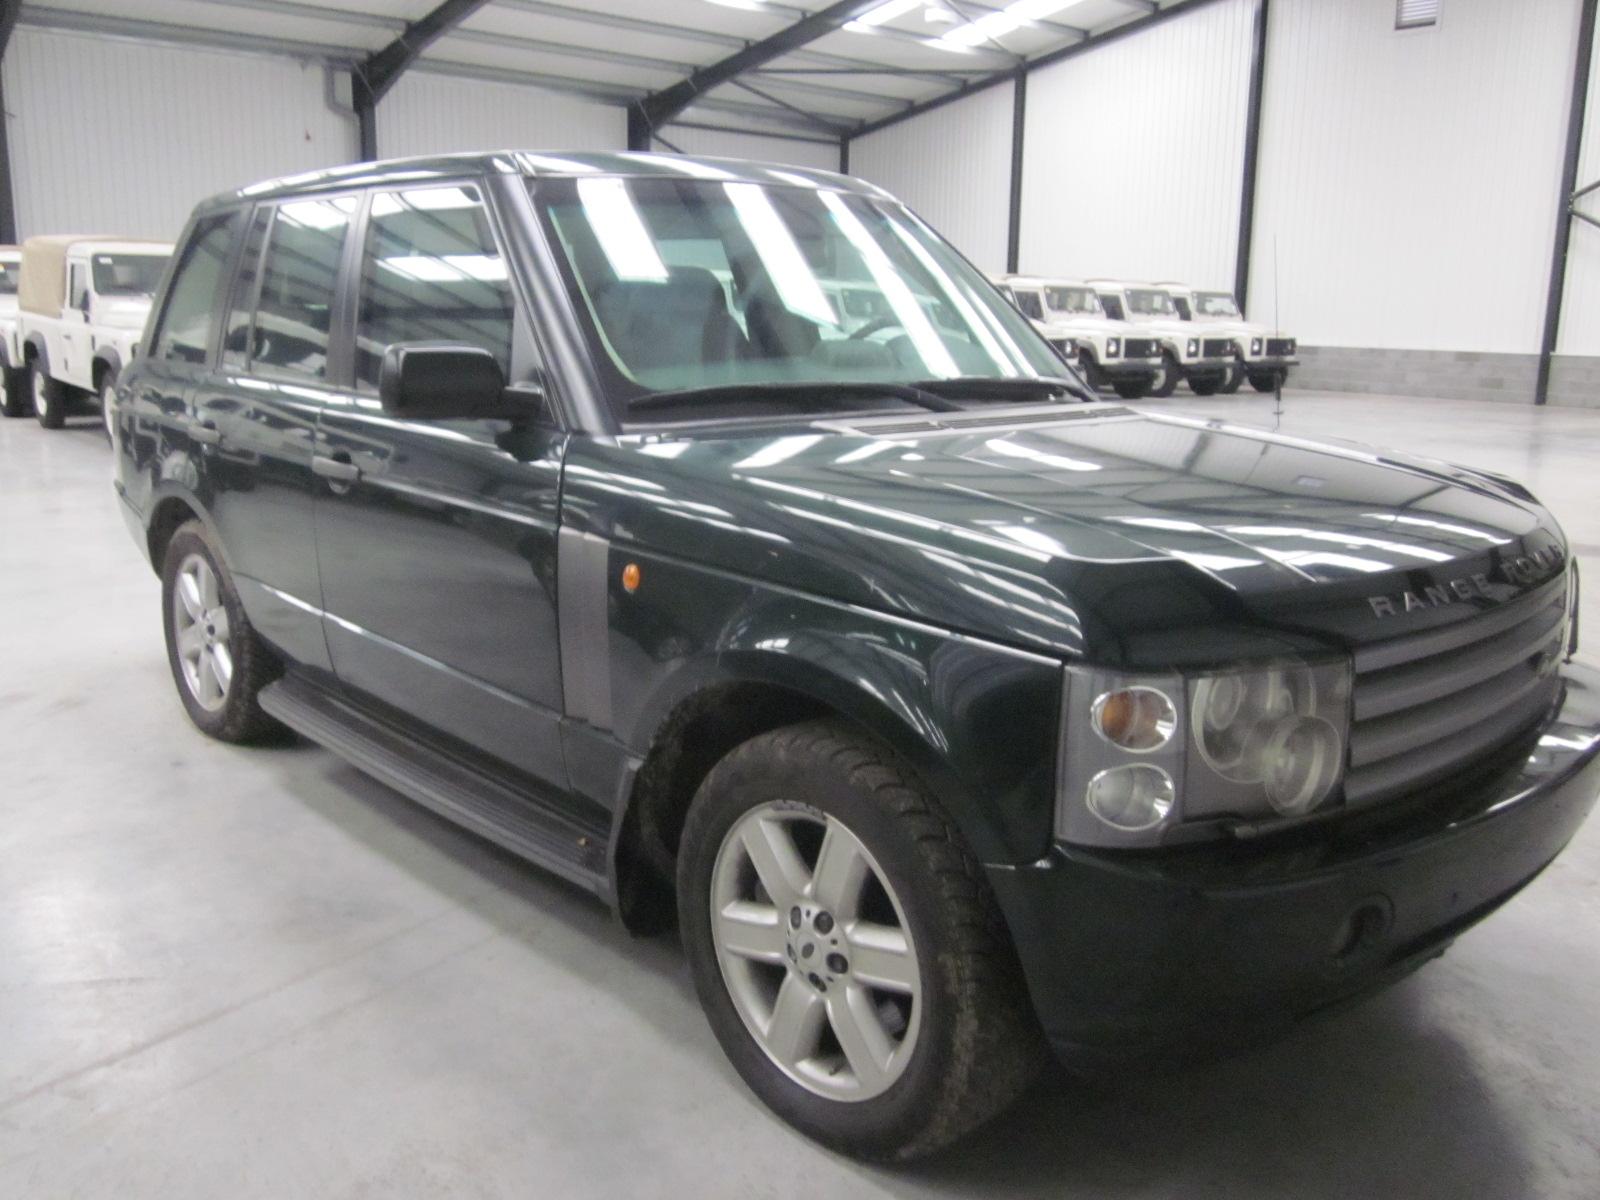 Armoured Range Rover vogue LHD V8